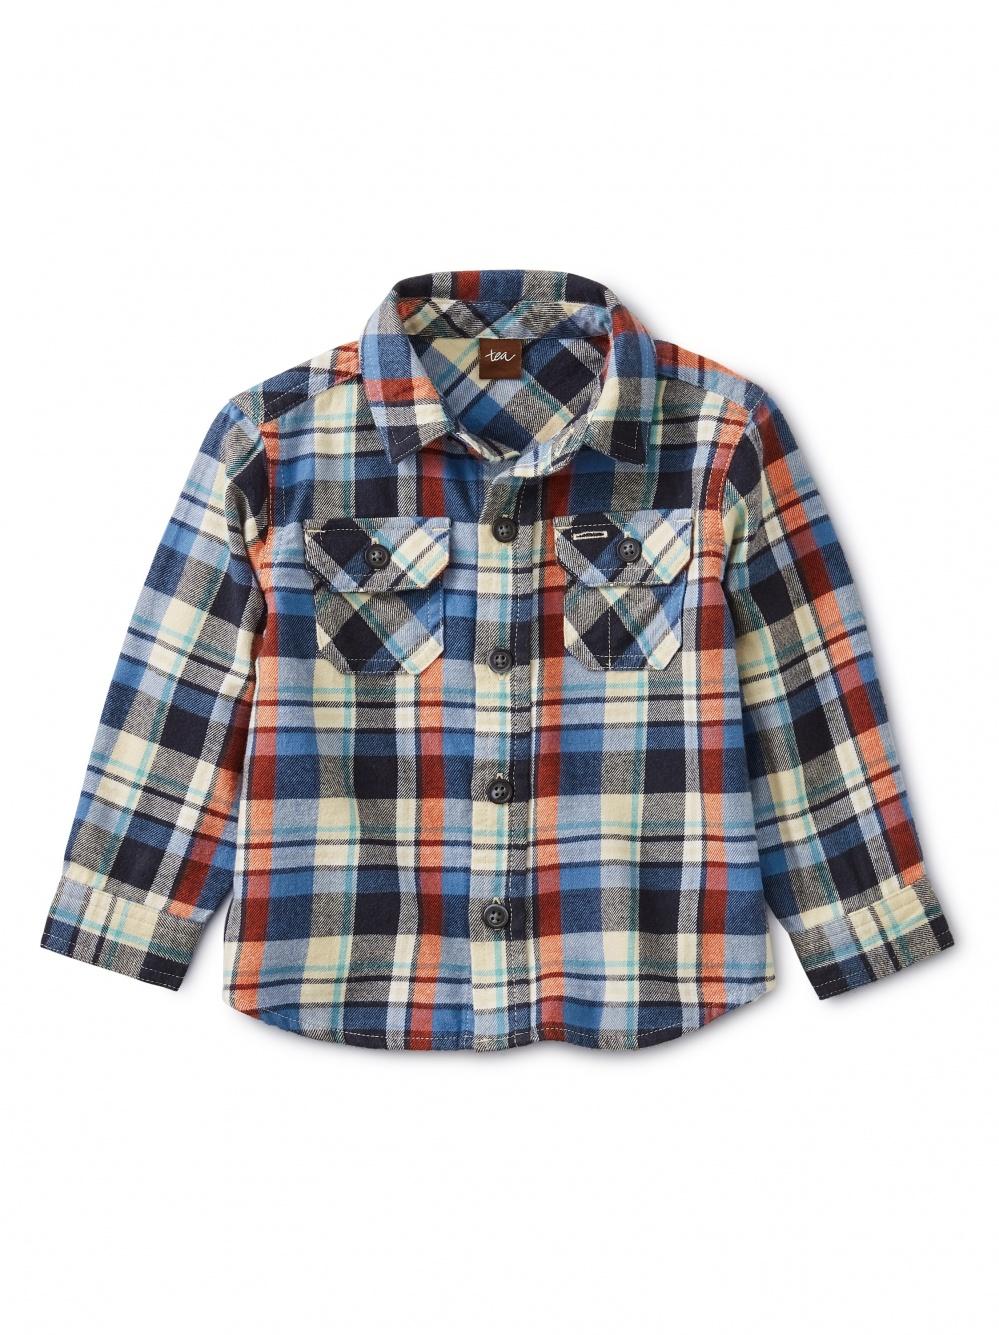 Flannel Plaid Baby Shirt